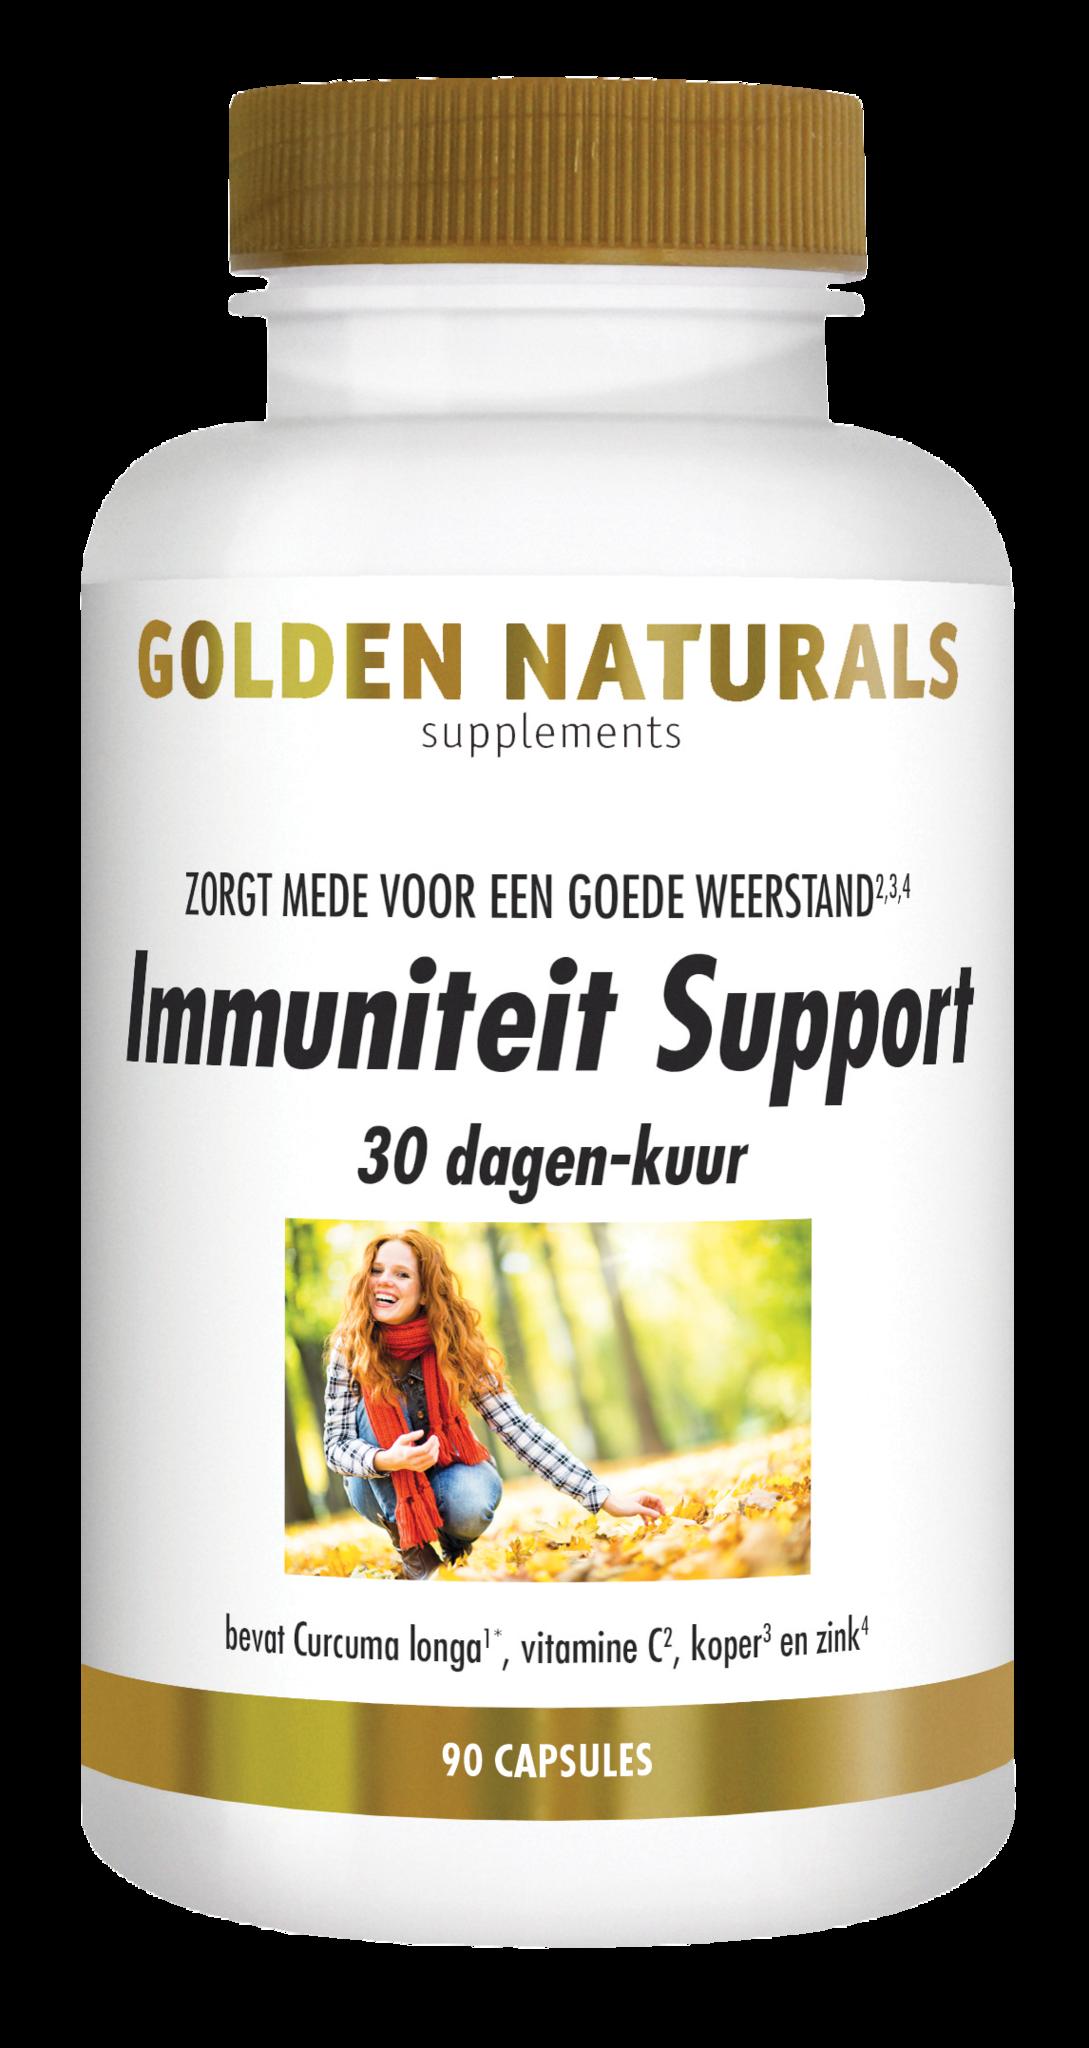 Golden Naturals Immuniteit Support 30 dagen-kuur